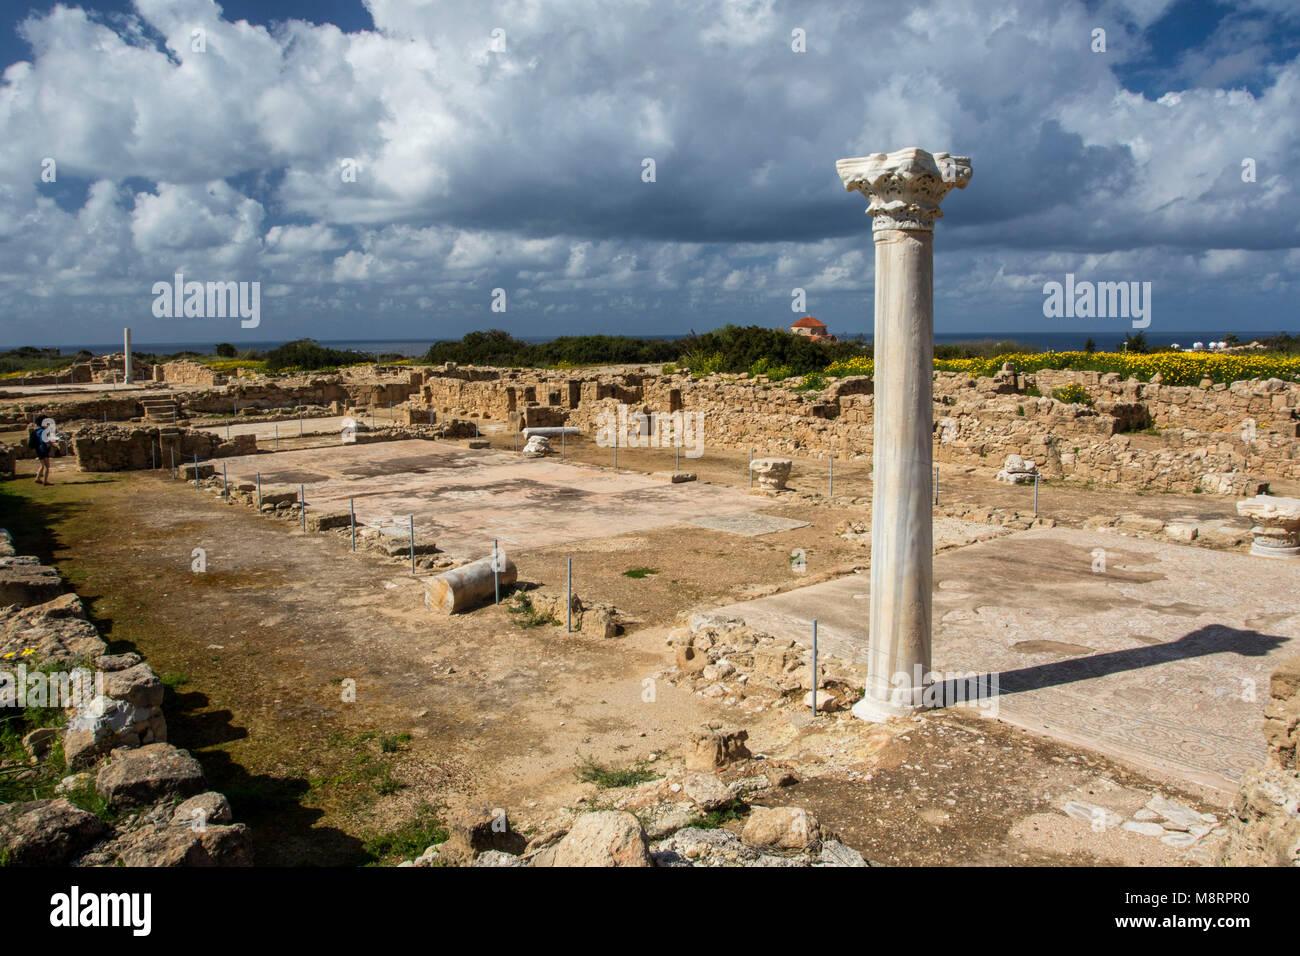 Archeoligical Website bei Agios Georgious, Paphos, Zypern, Mittelmeer Stockfoto